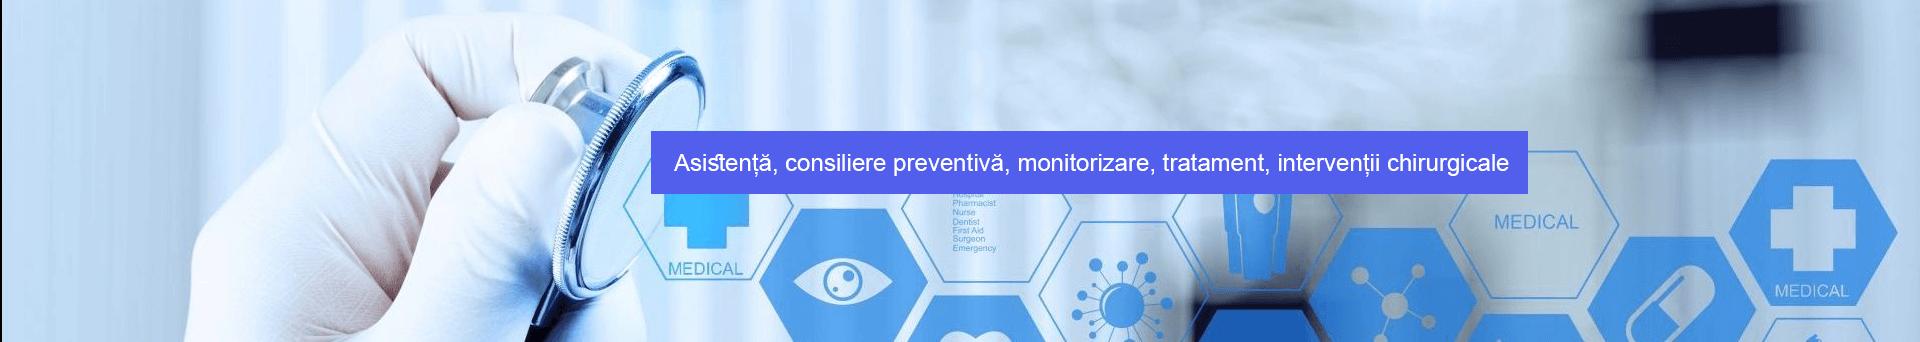 Asistență, consiliere preventivă, monitorizare, tratament, intervenții chirurgicale